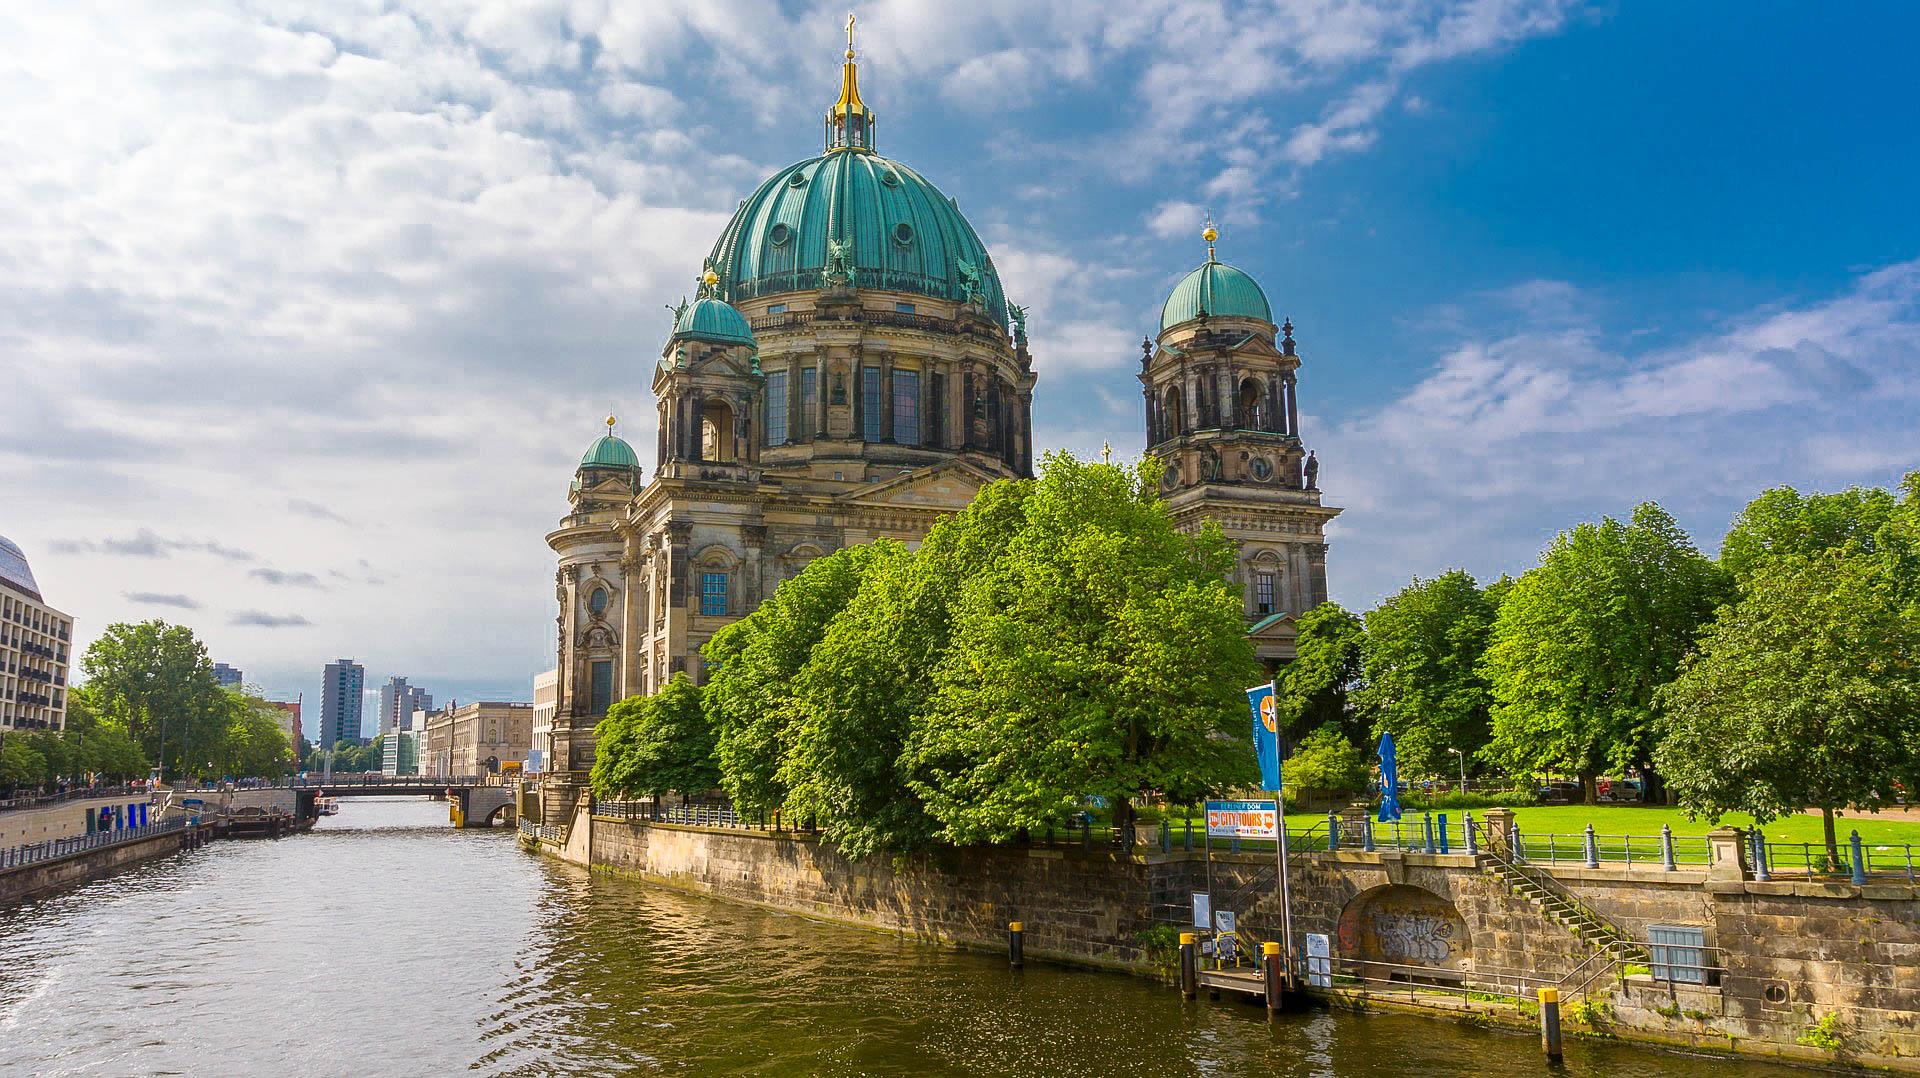 Німеччина Берлін річка